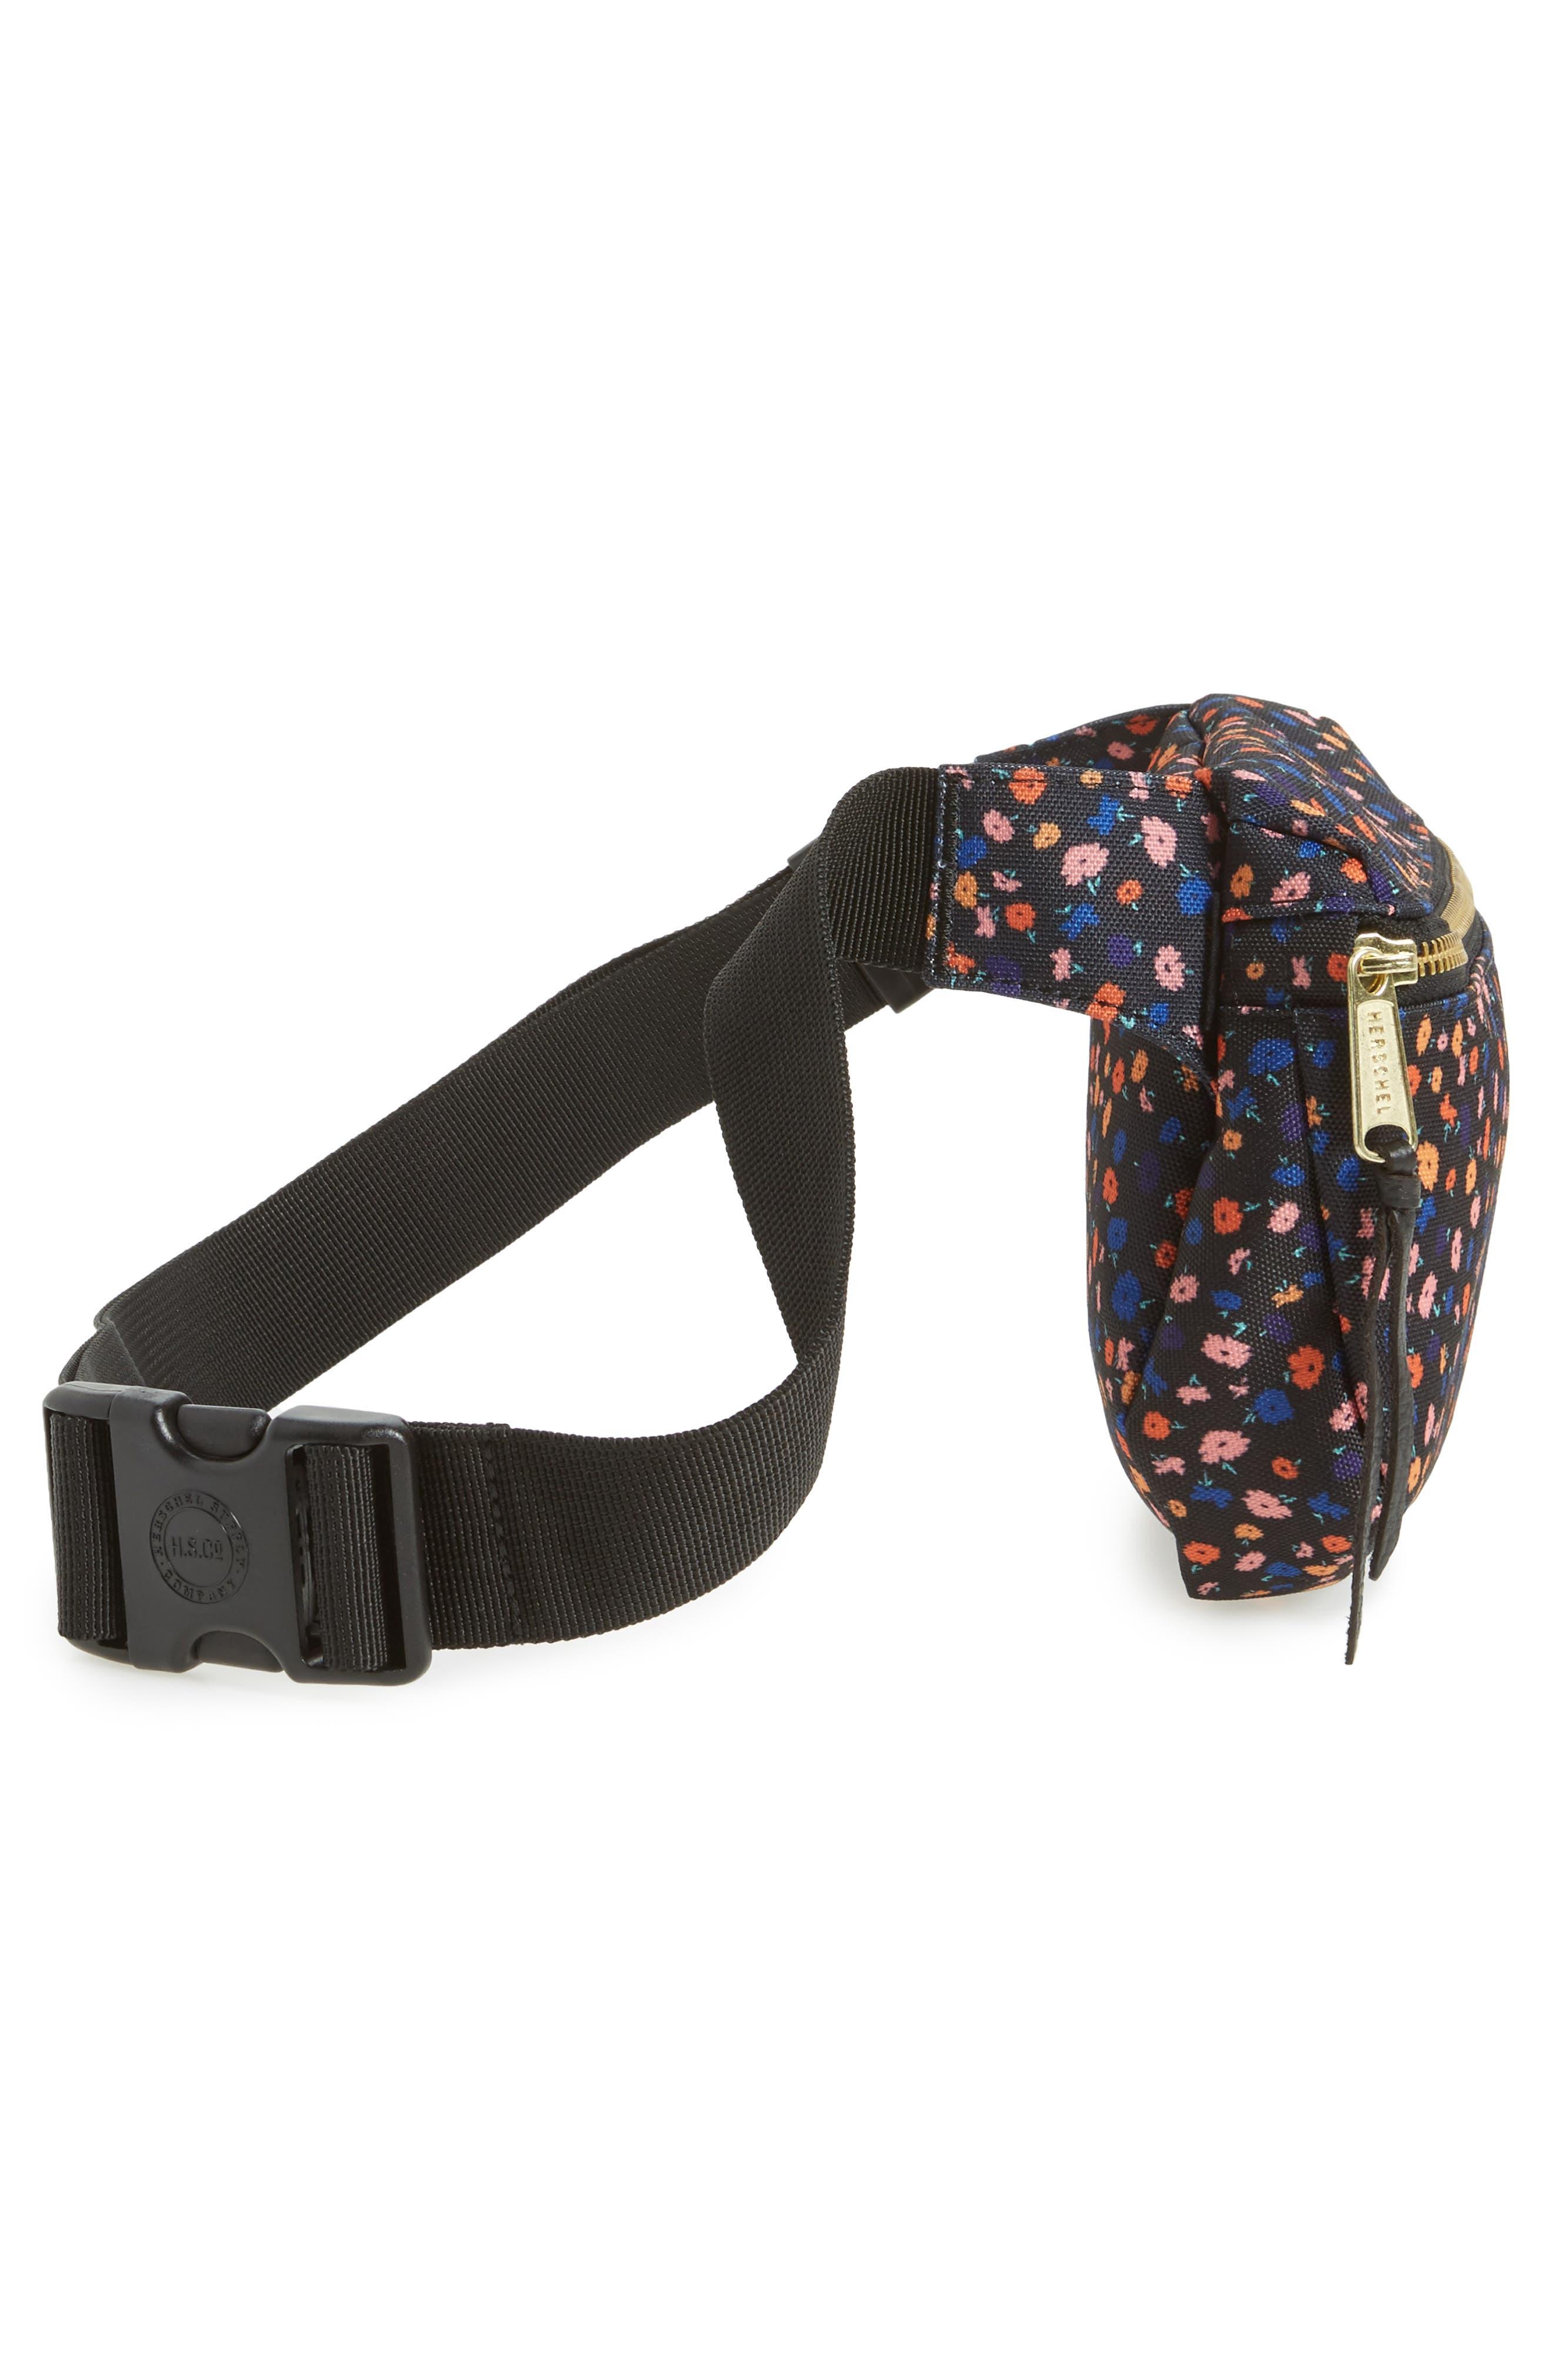 Fifteen Belt Bag,                             Alternate thumbnail 5, color,                             BLACK MINI FLORAL